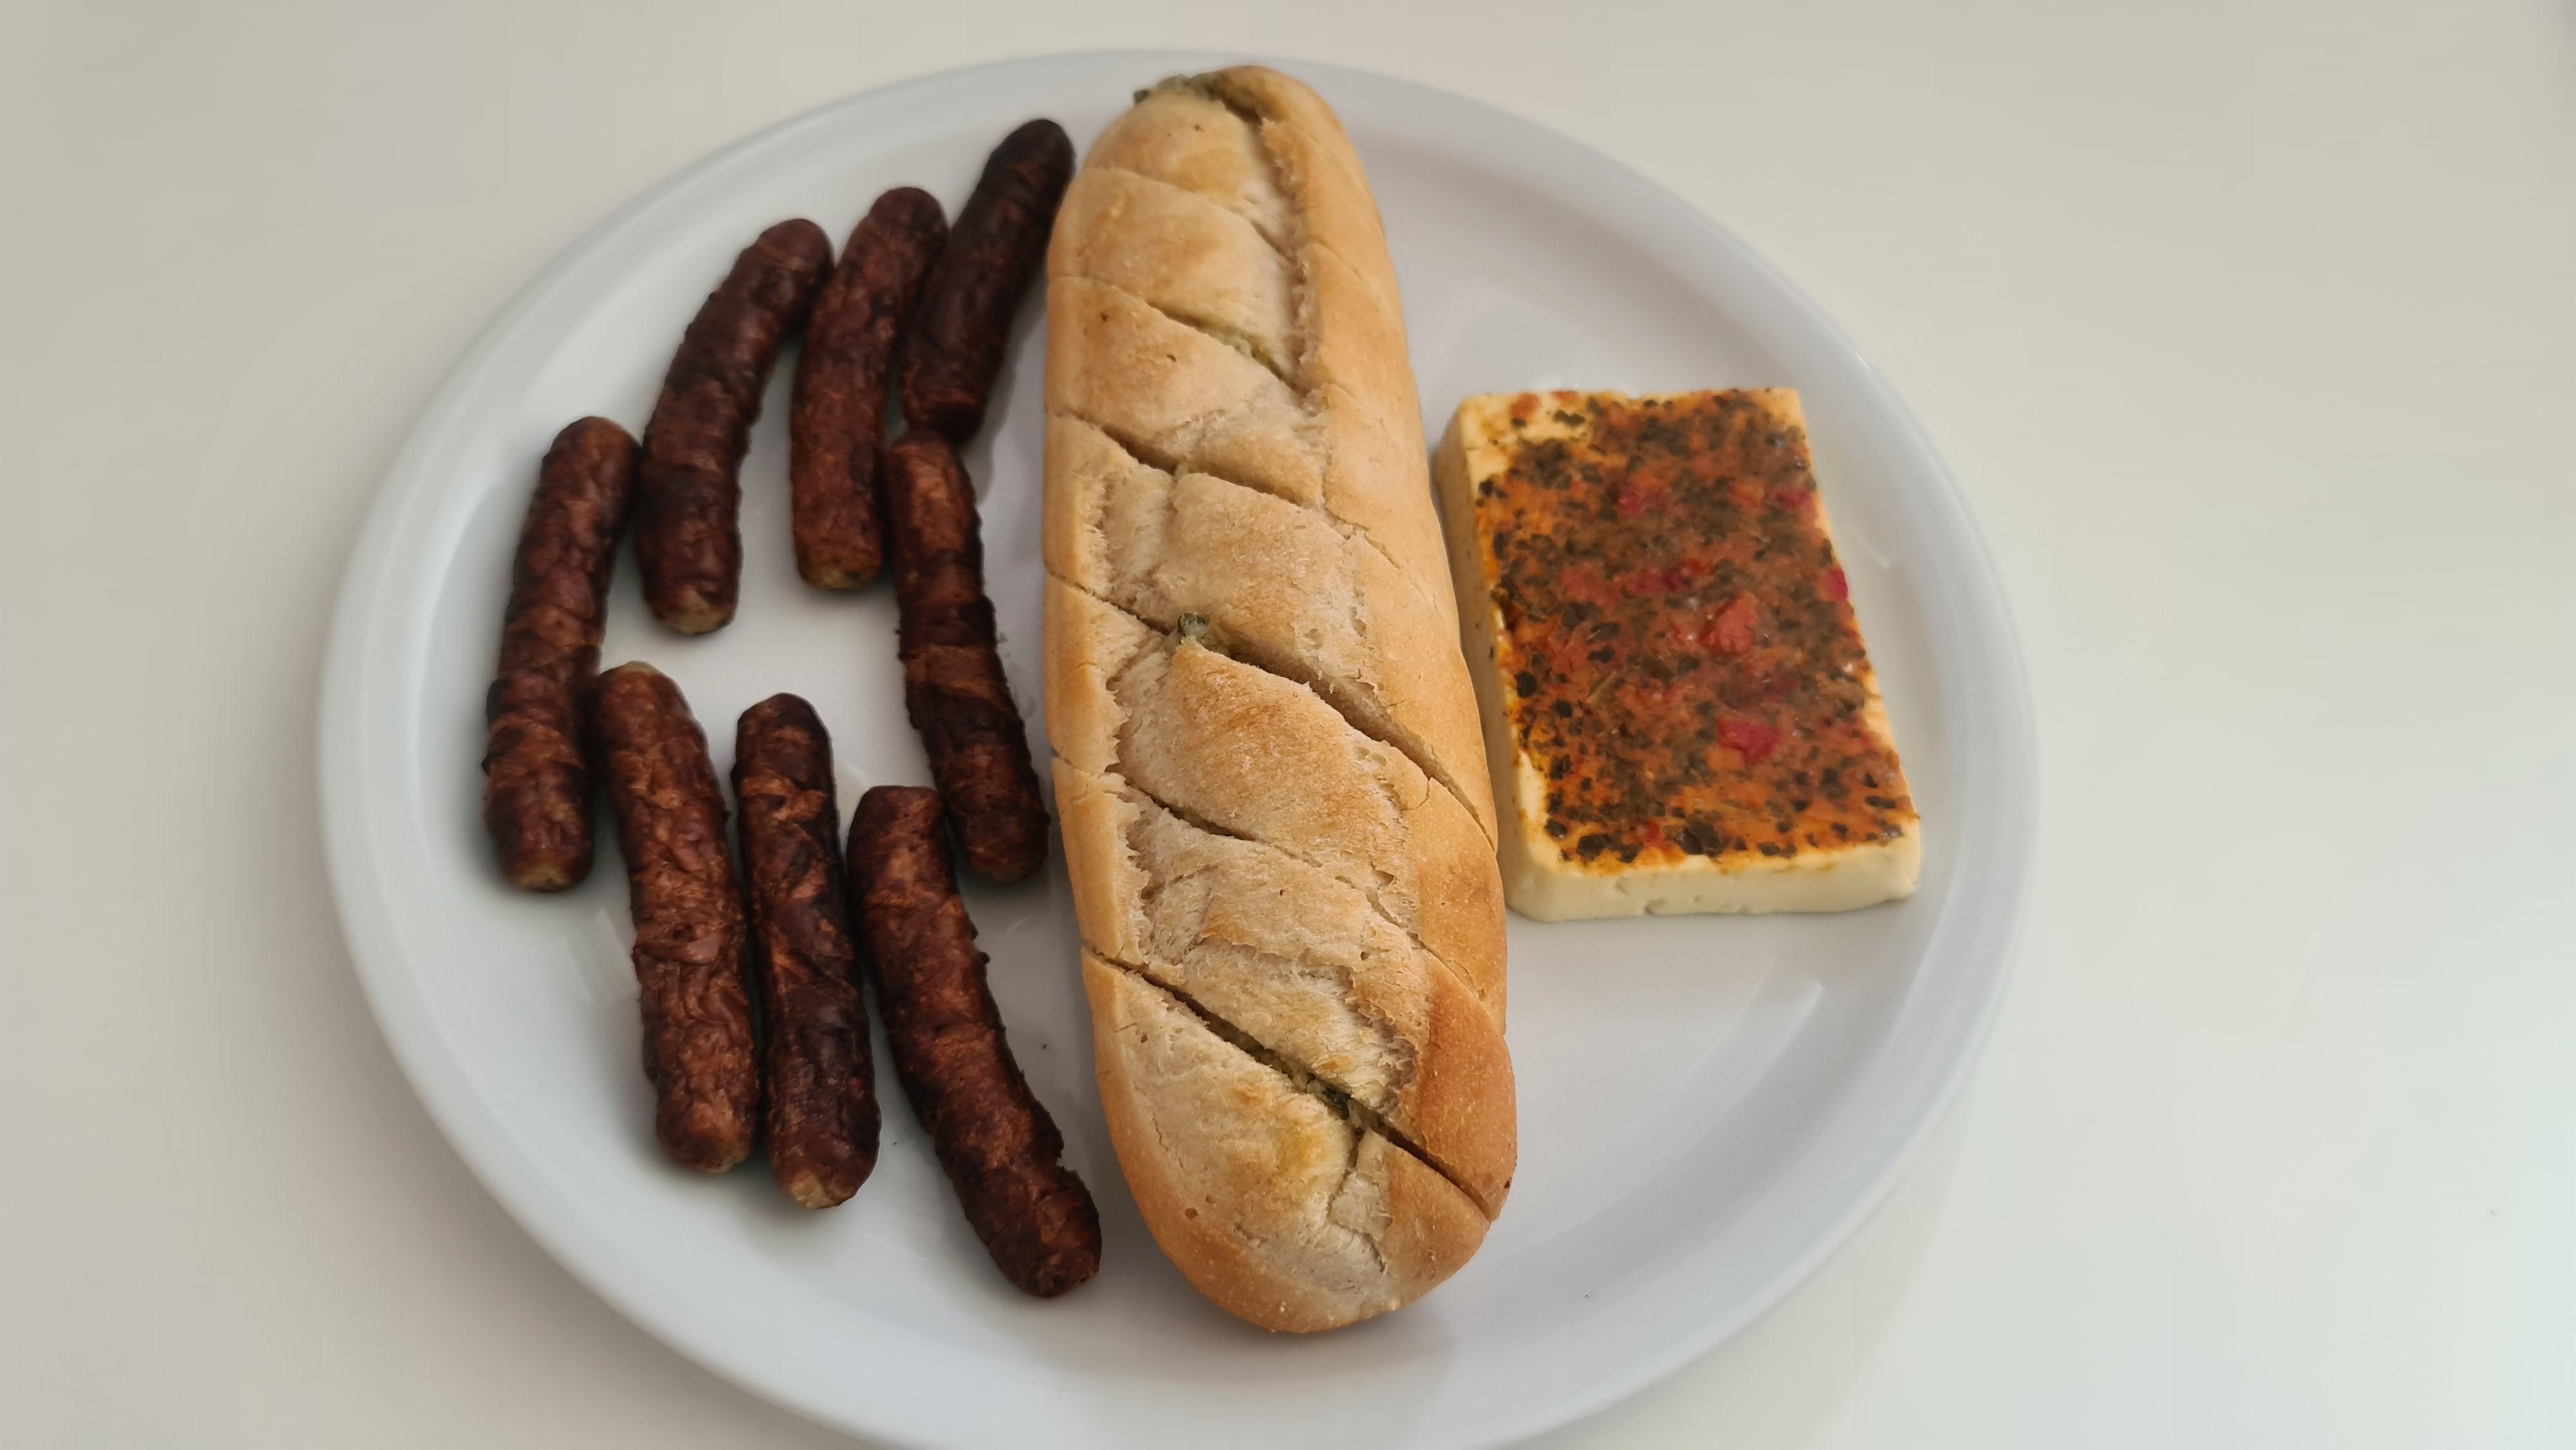 https://foodloader.net/Holz_2020-05-01_Nuernberger_mit_Feta_und_Knoblauchbaguette.jpg